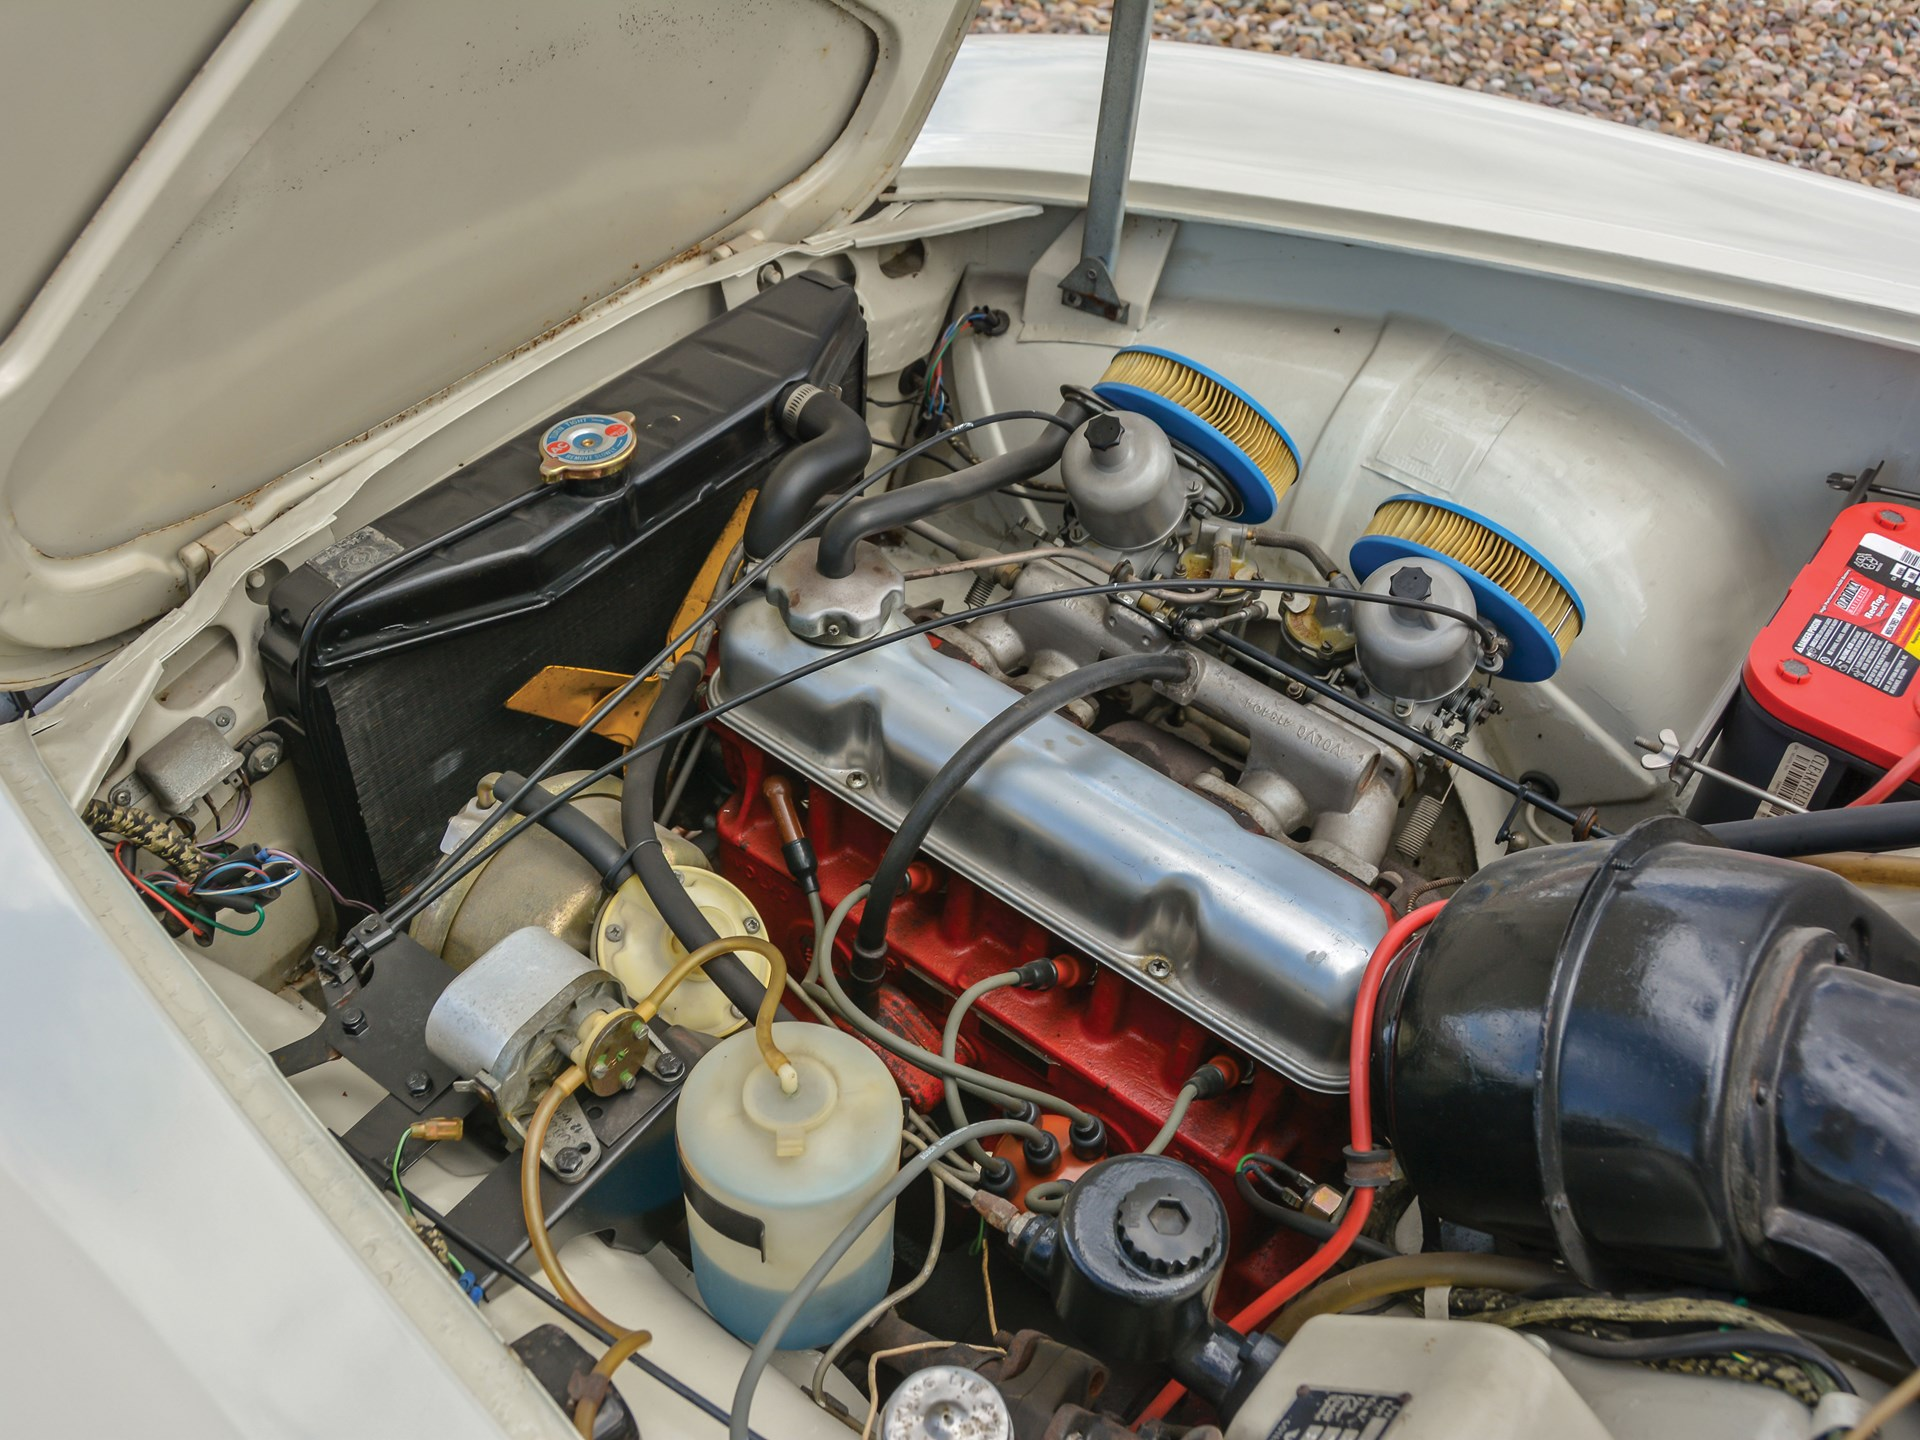 1965 Volvo 1800S engine